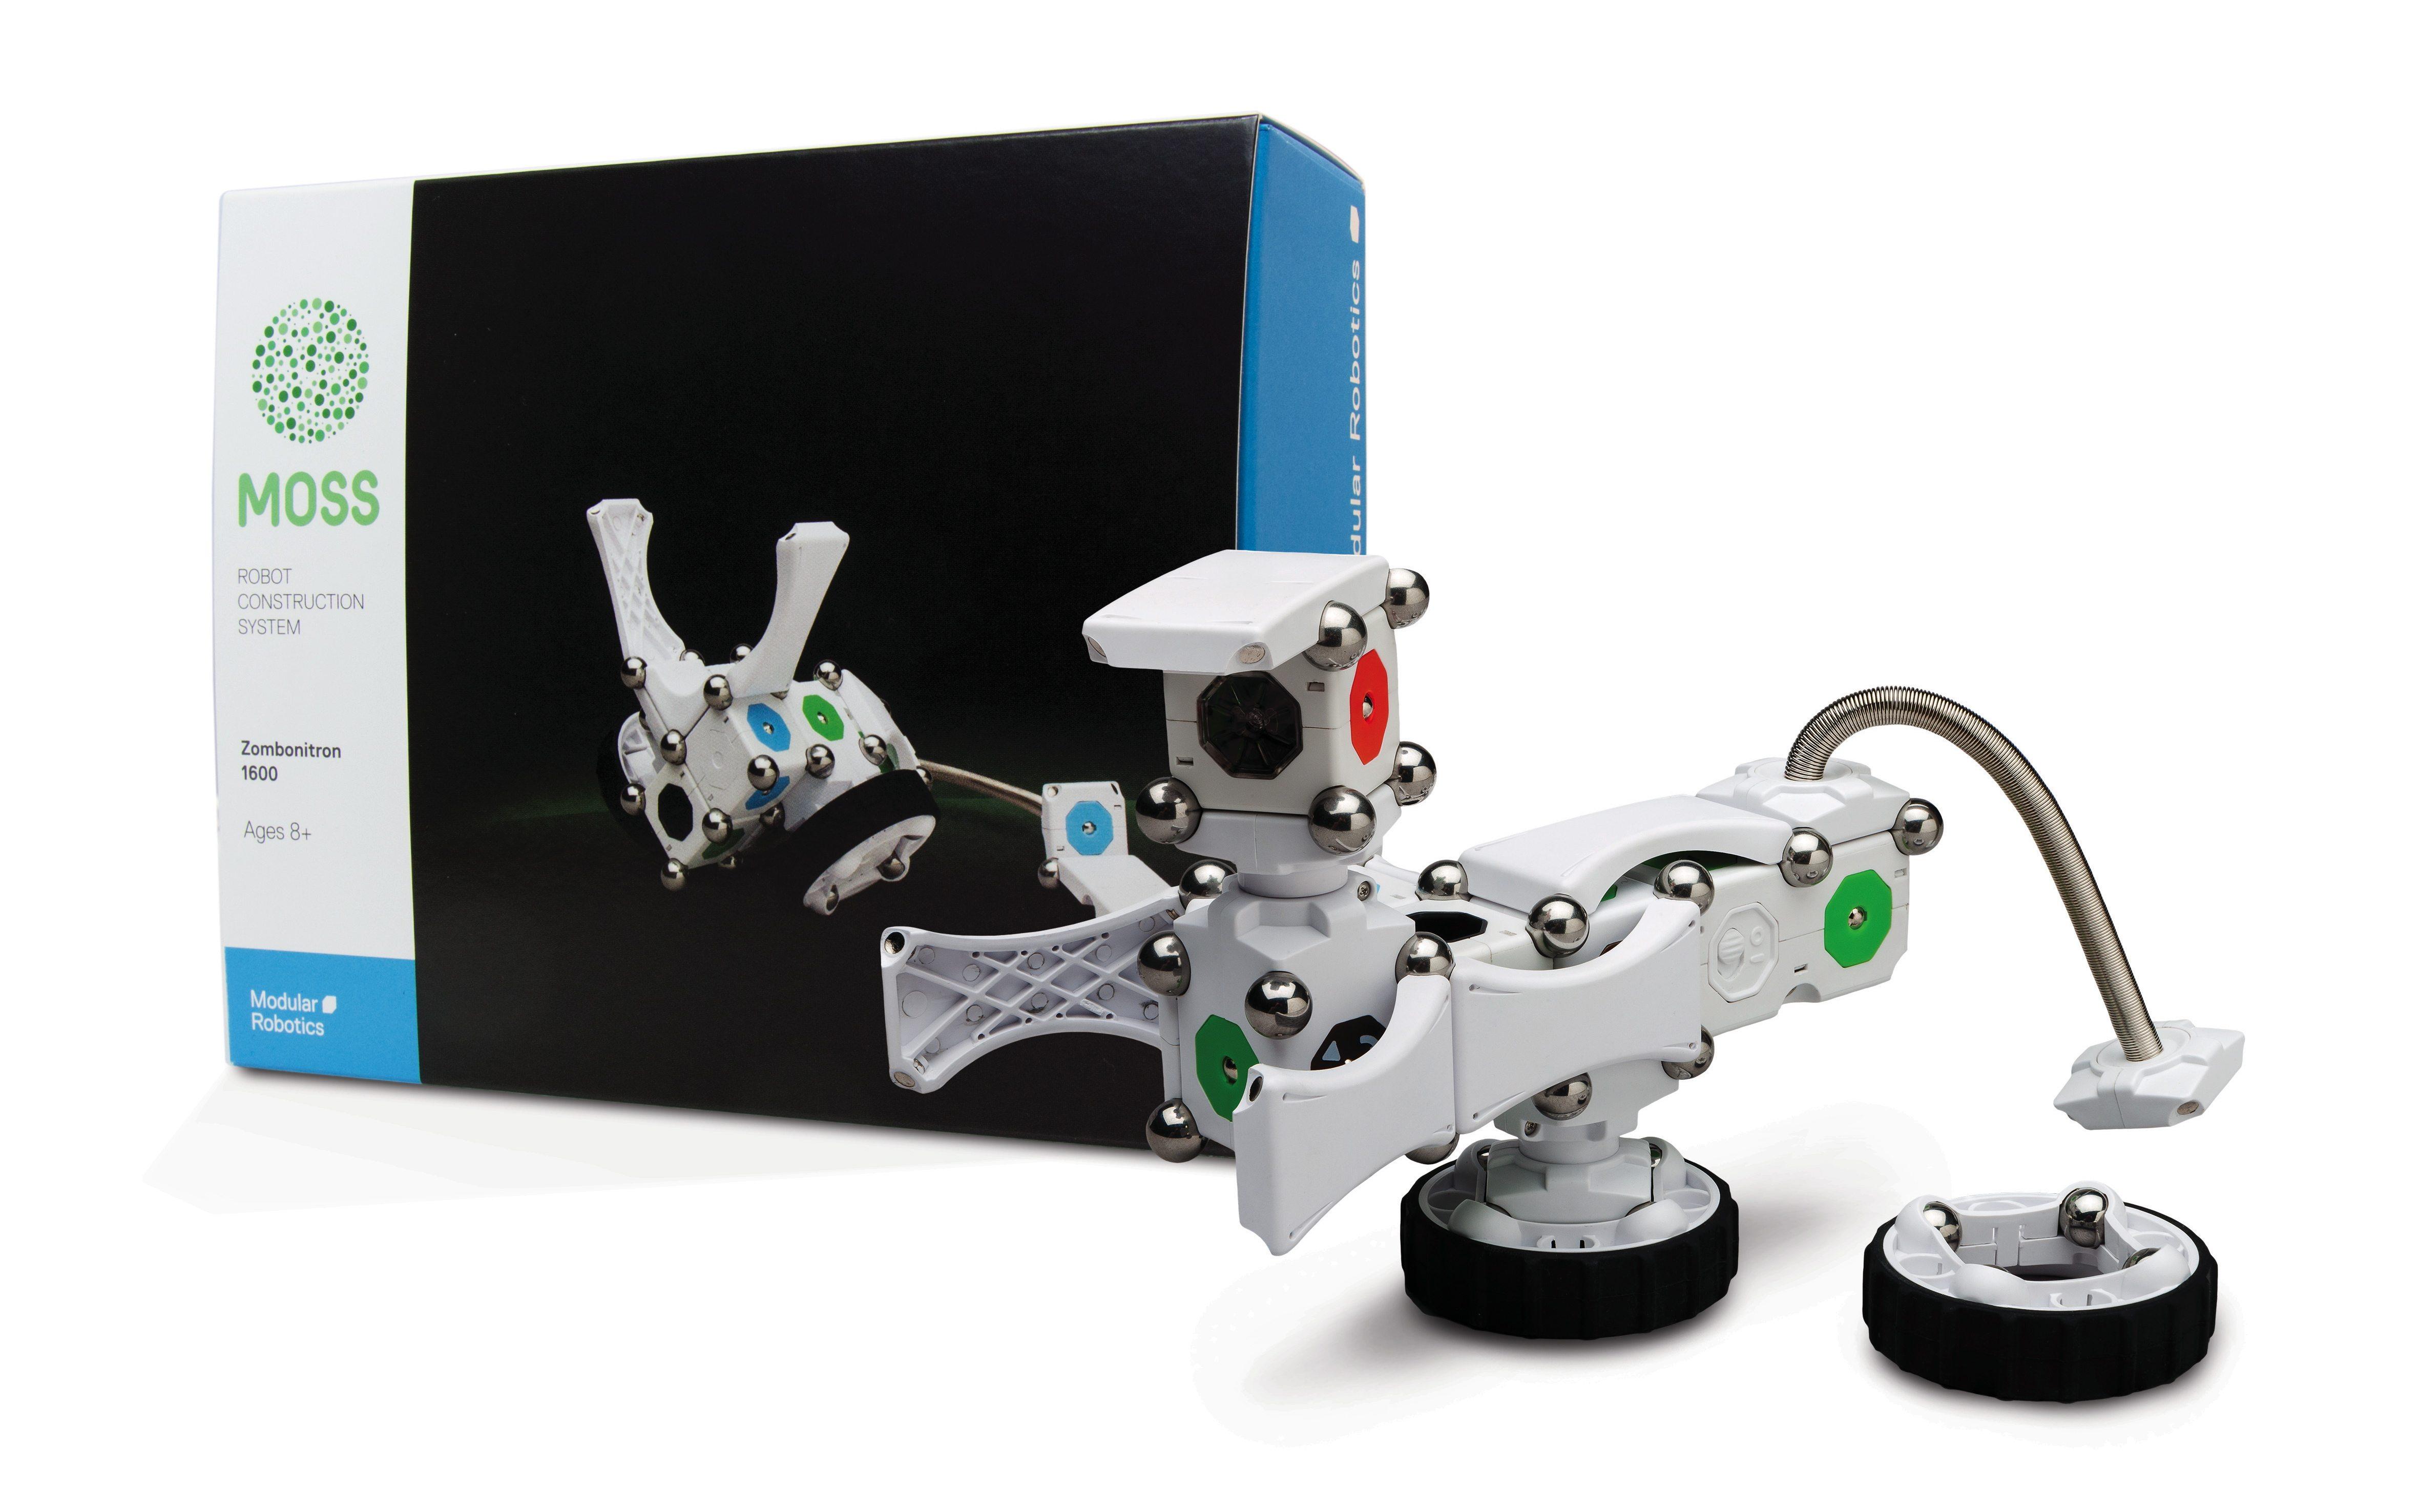 MOSS Zombonitron Kit. Photo credit: Modular Robotics